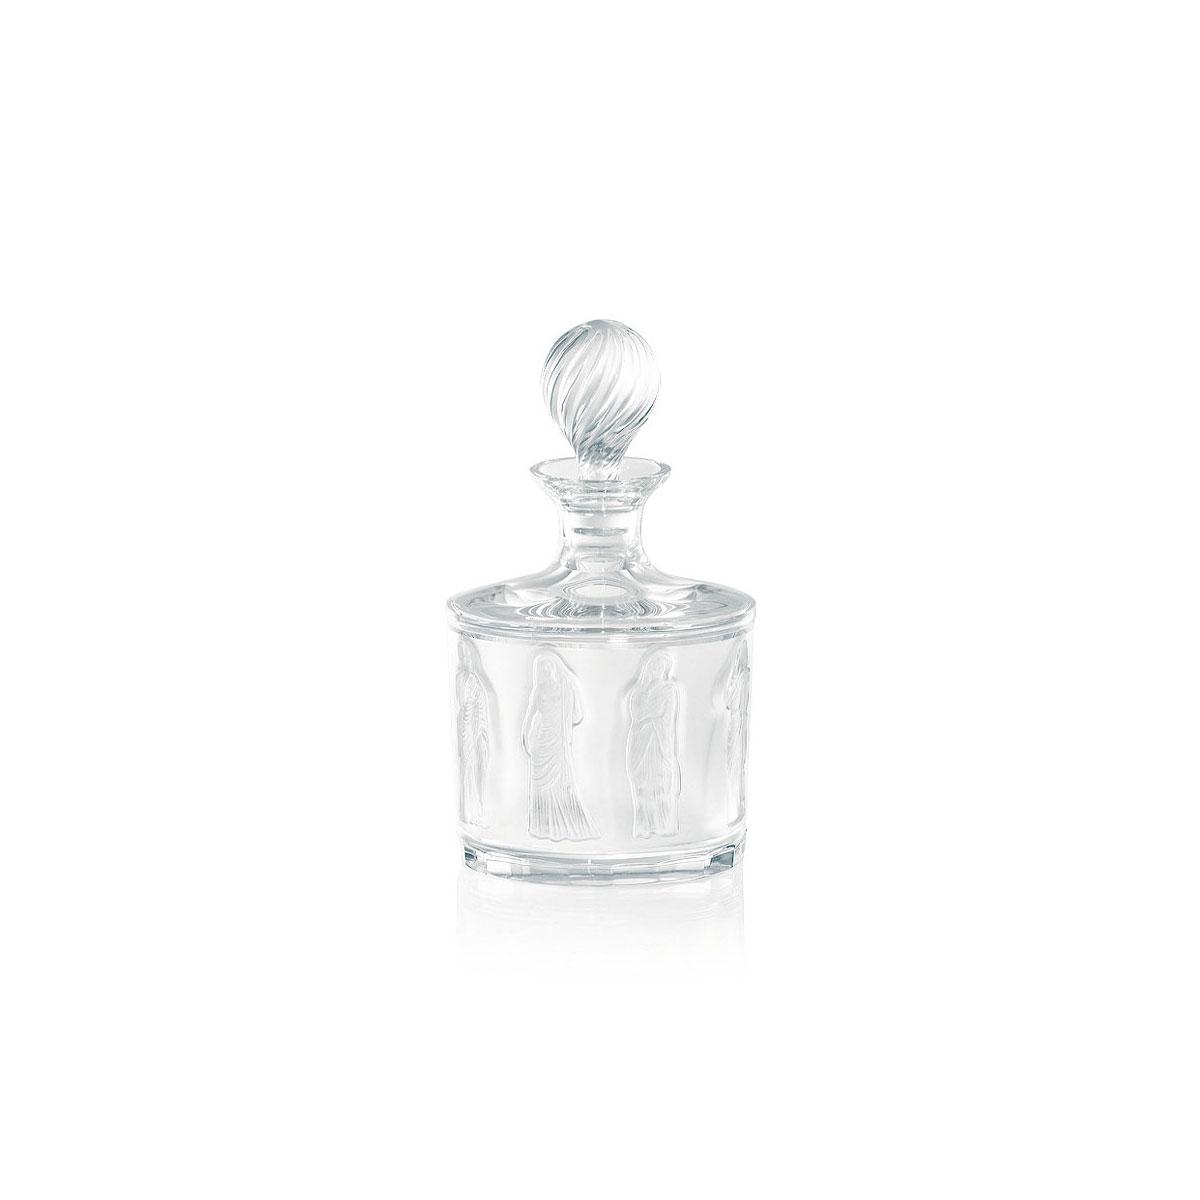 Lalique Crystal, Femmes Antiques Decanter